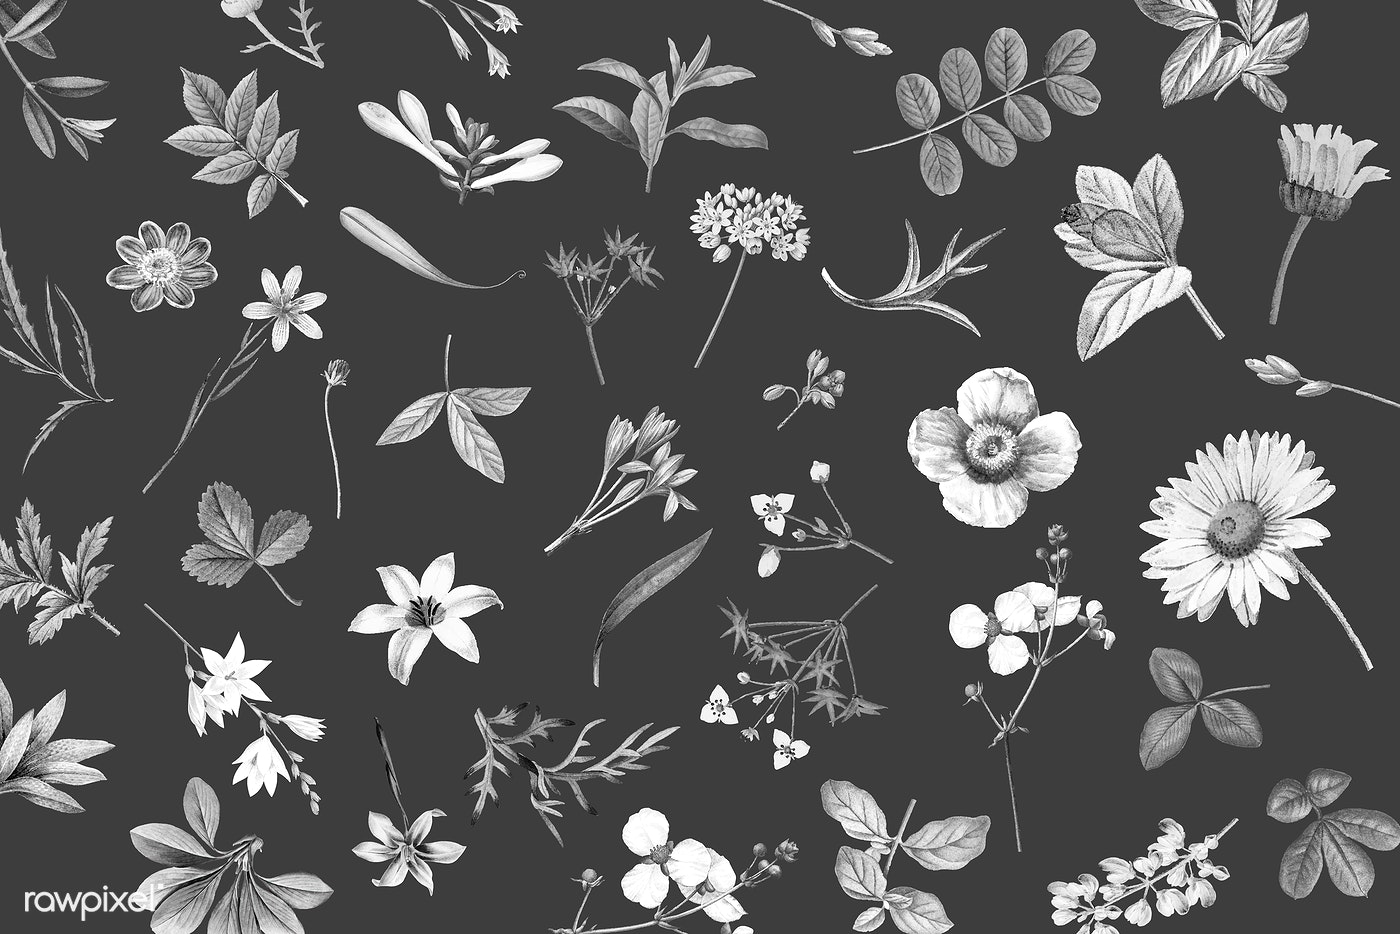 Floral Background Illustration Royalty Free Vector 1201086